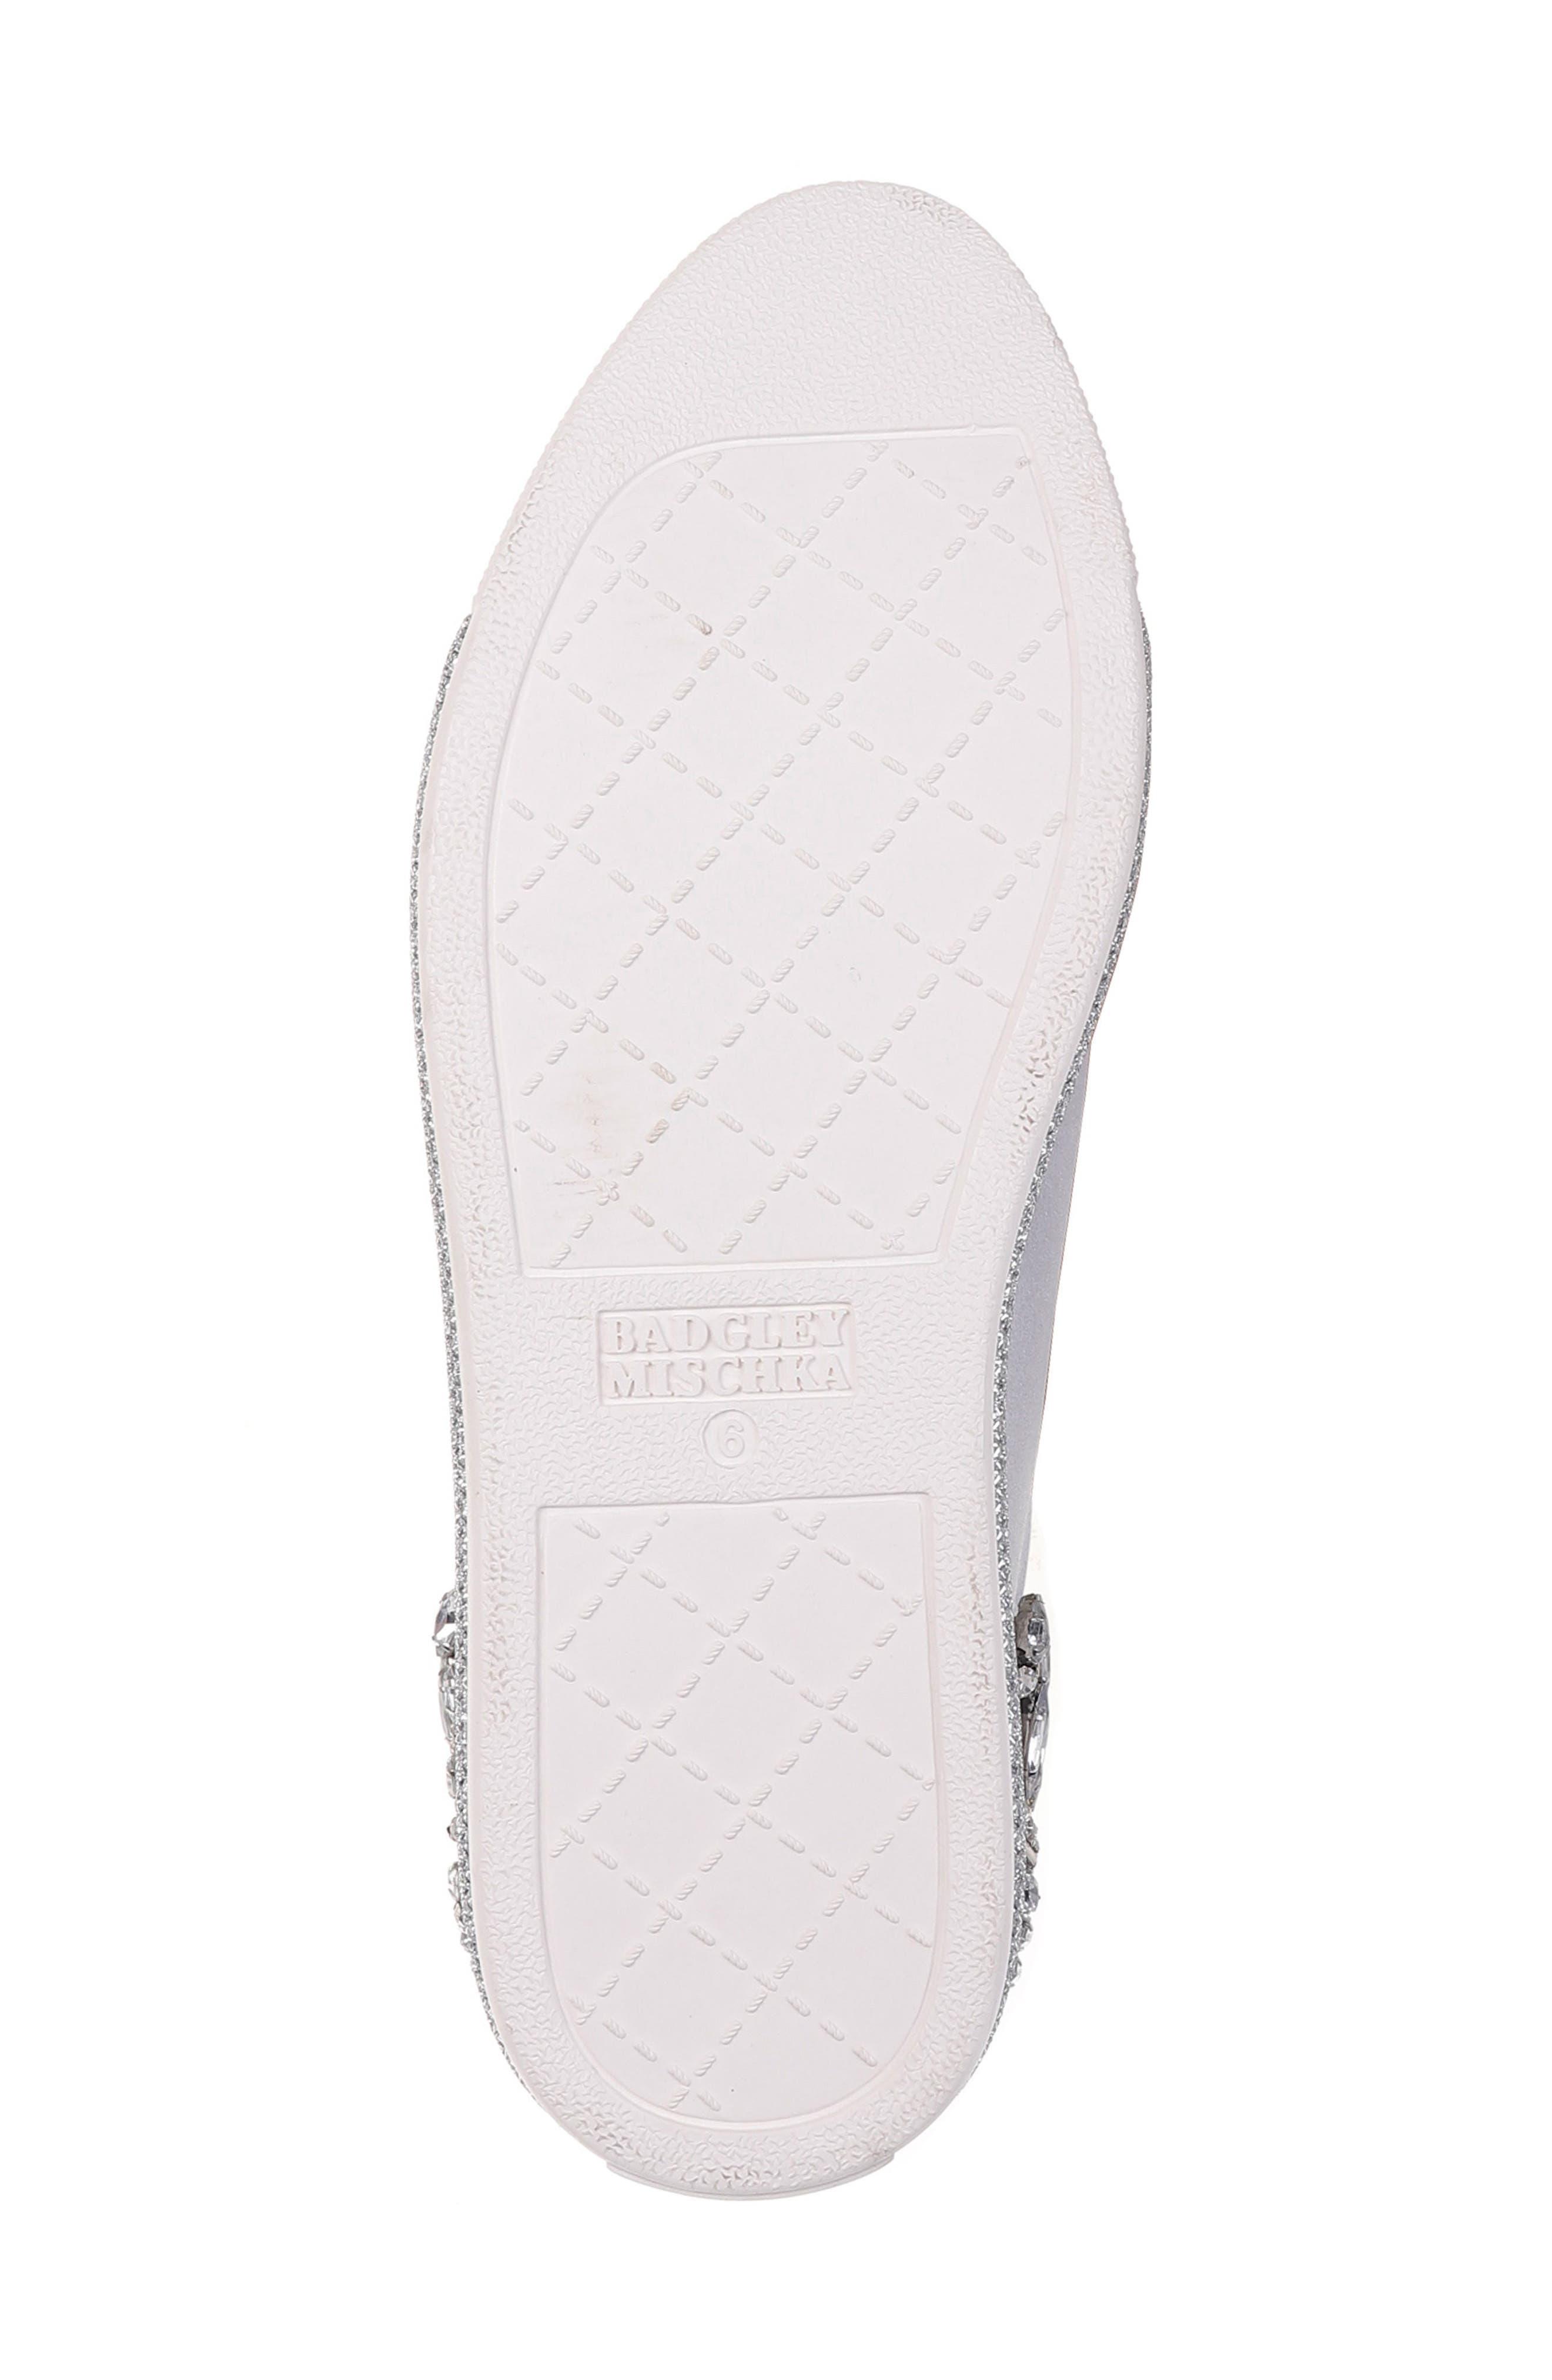 Badgley Mischka Shirley Crystal Embellished Sneaker,                             Alternate thumbnail 6, color,                             045